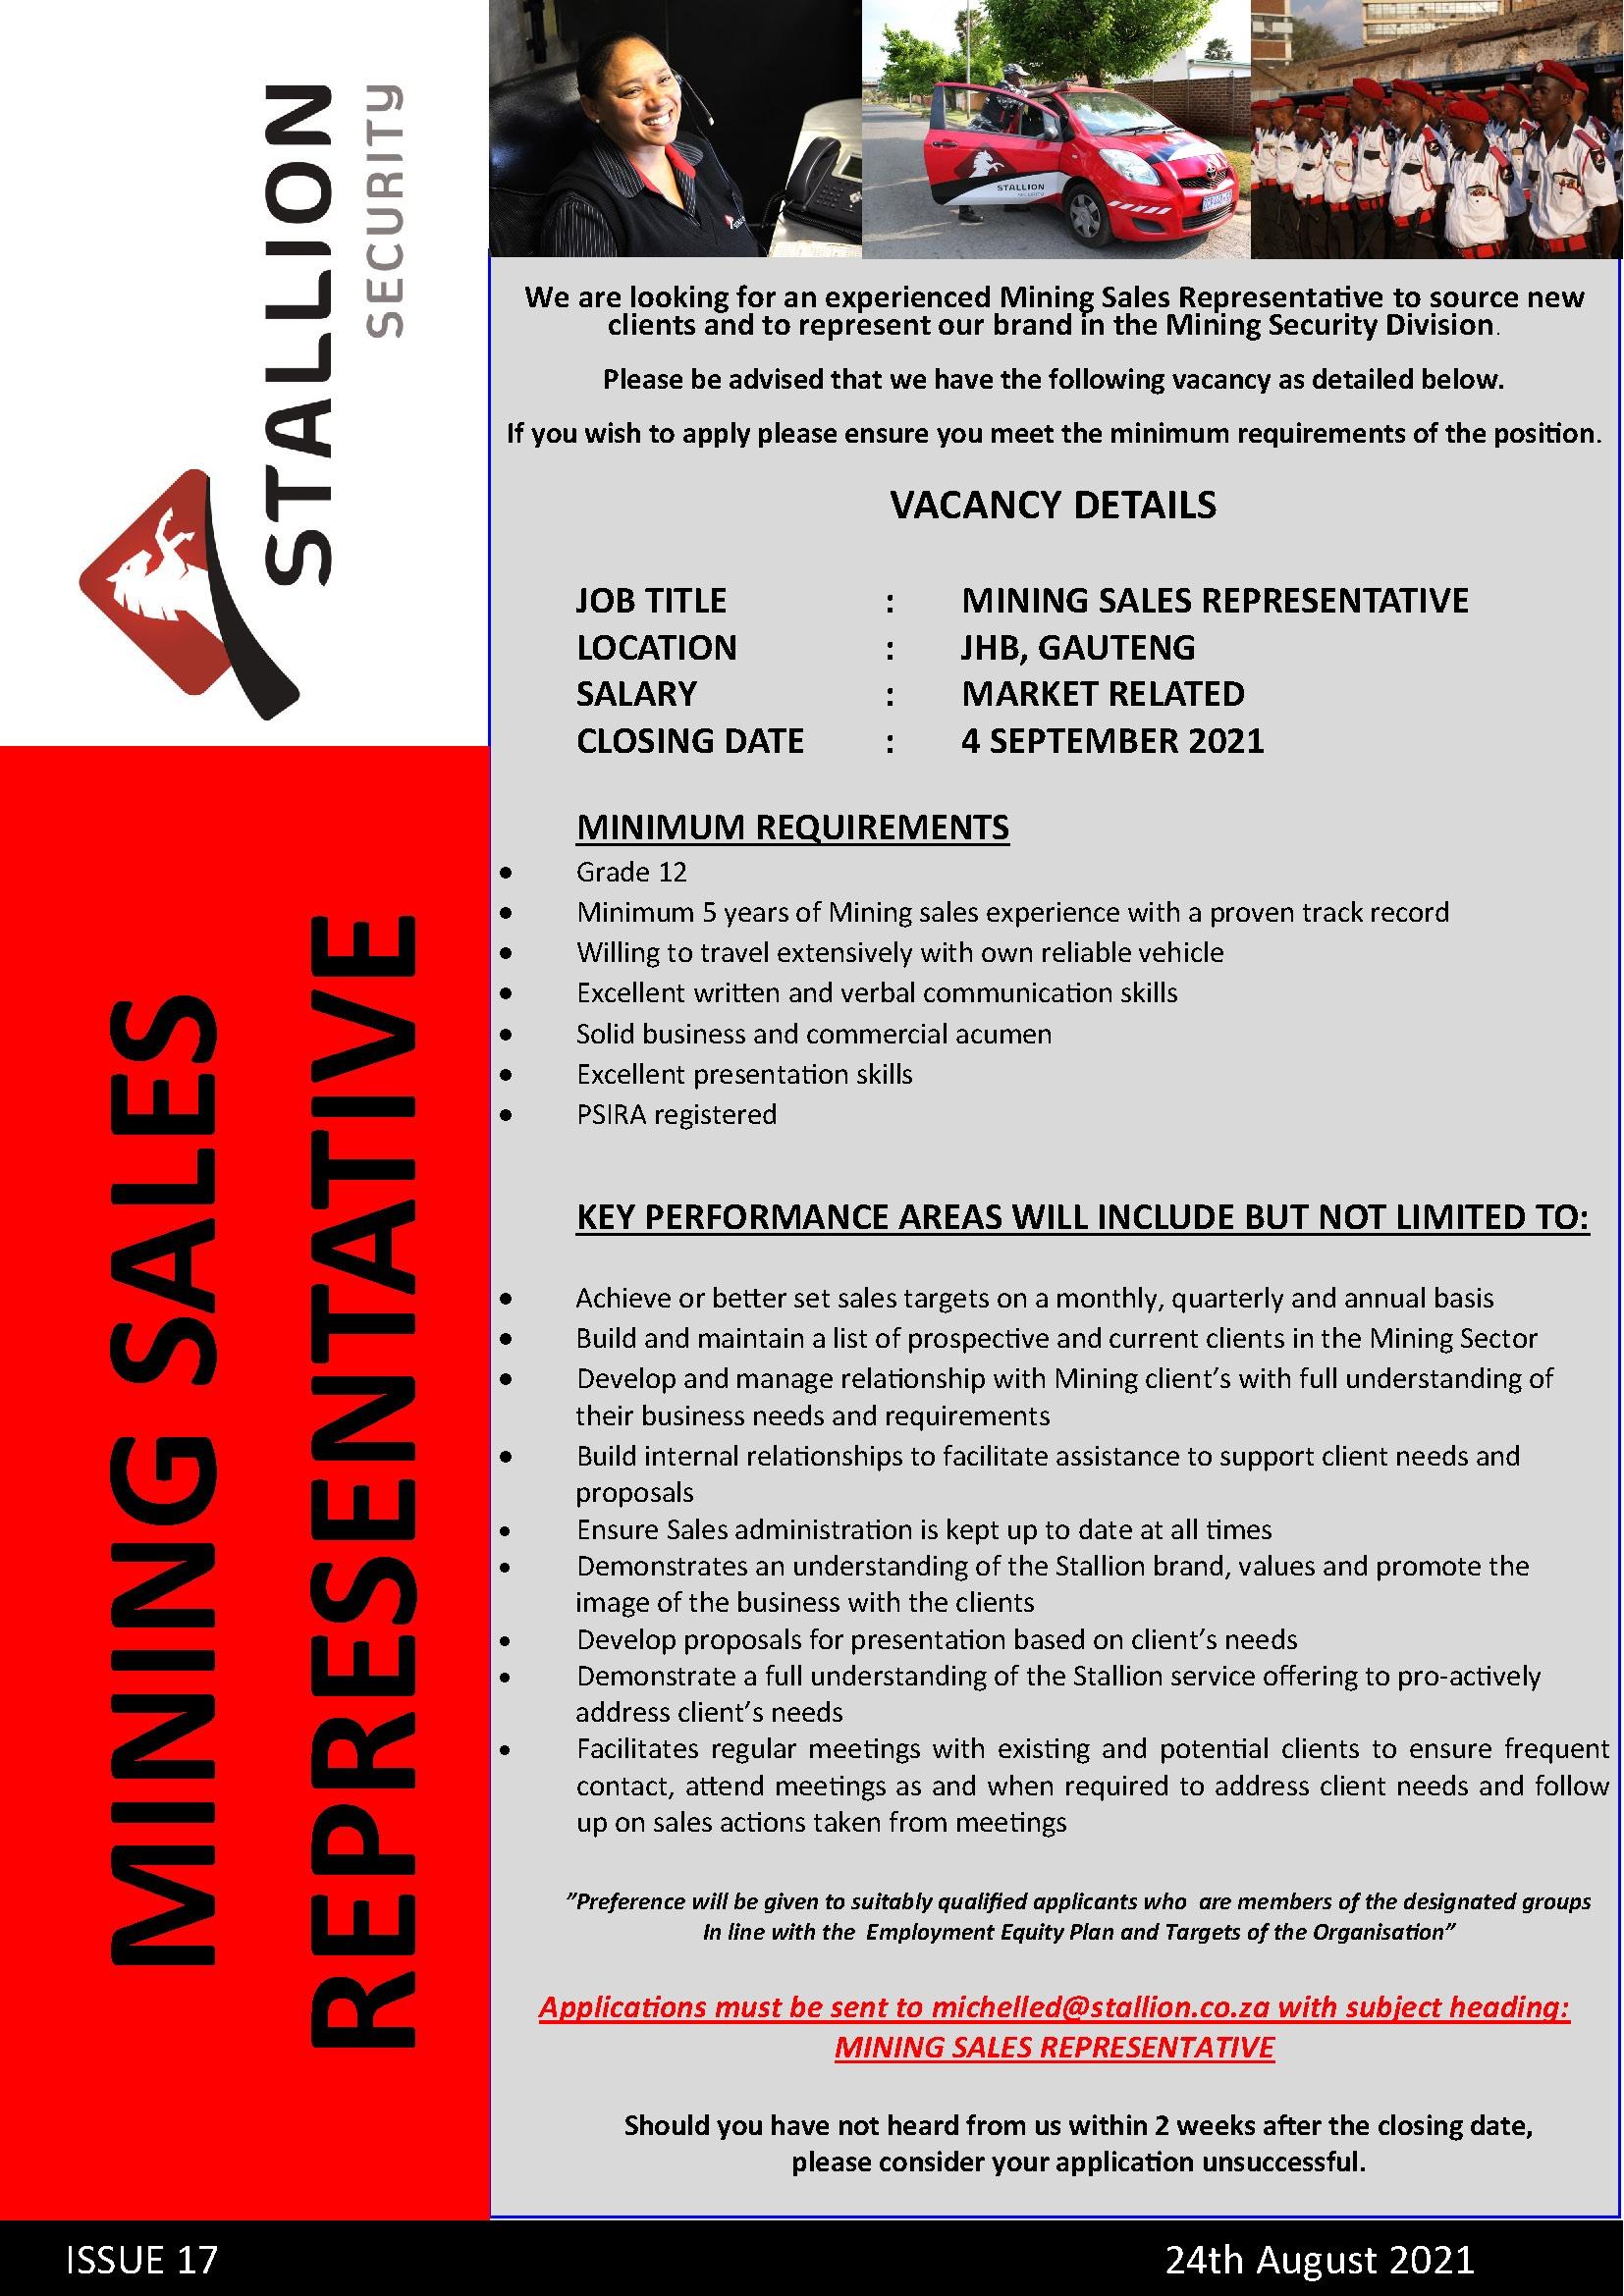 Mining Sales Representative